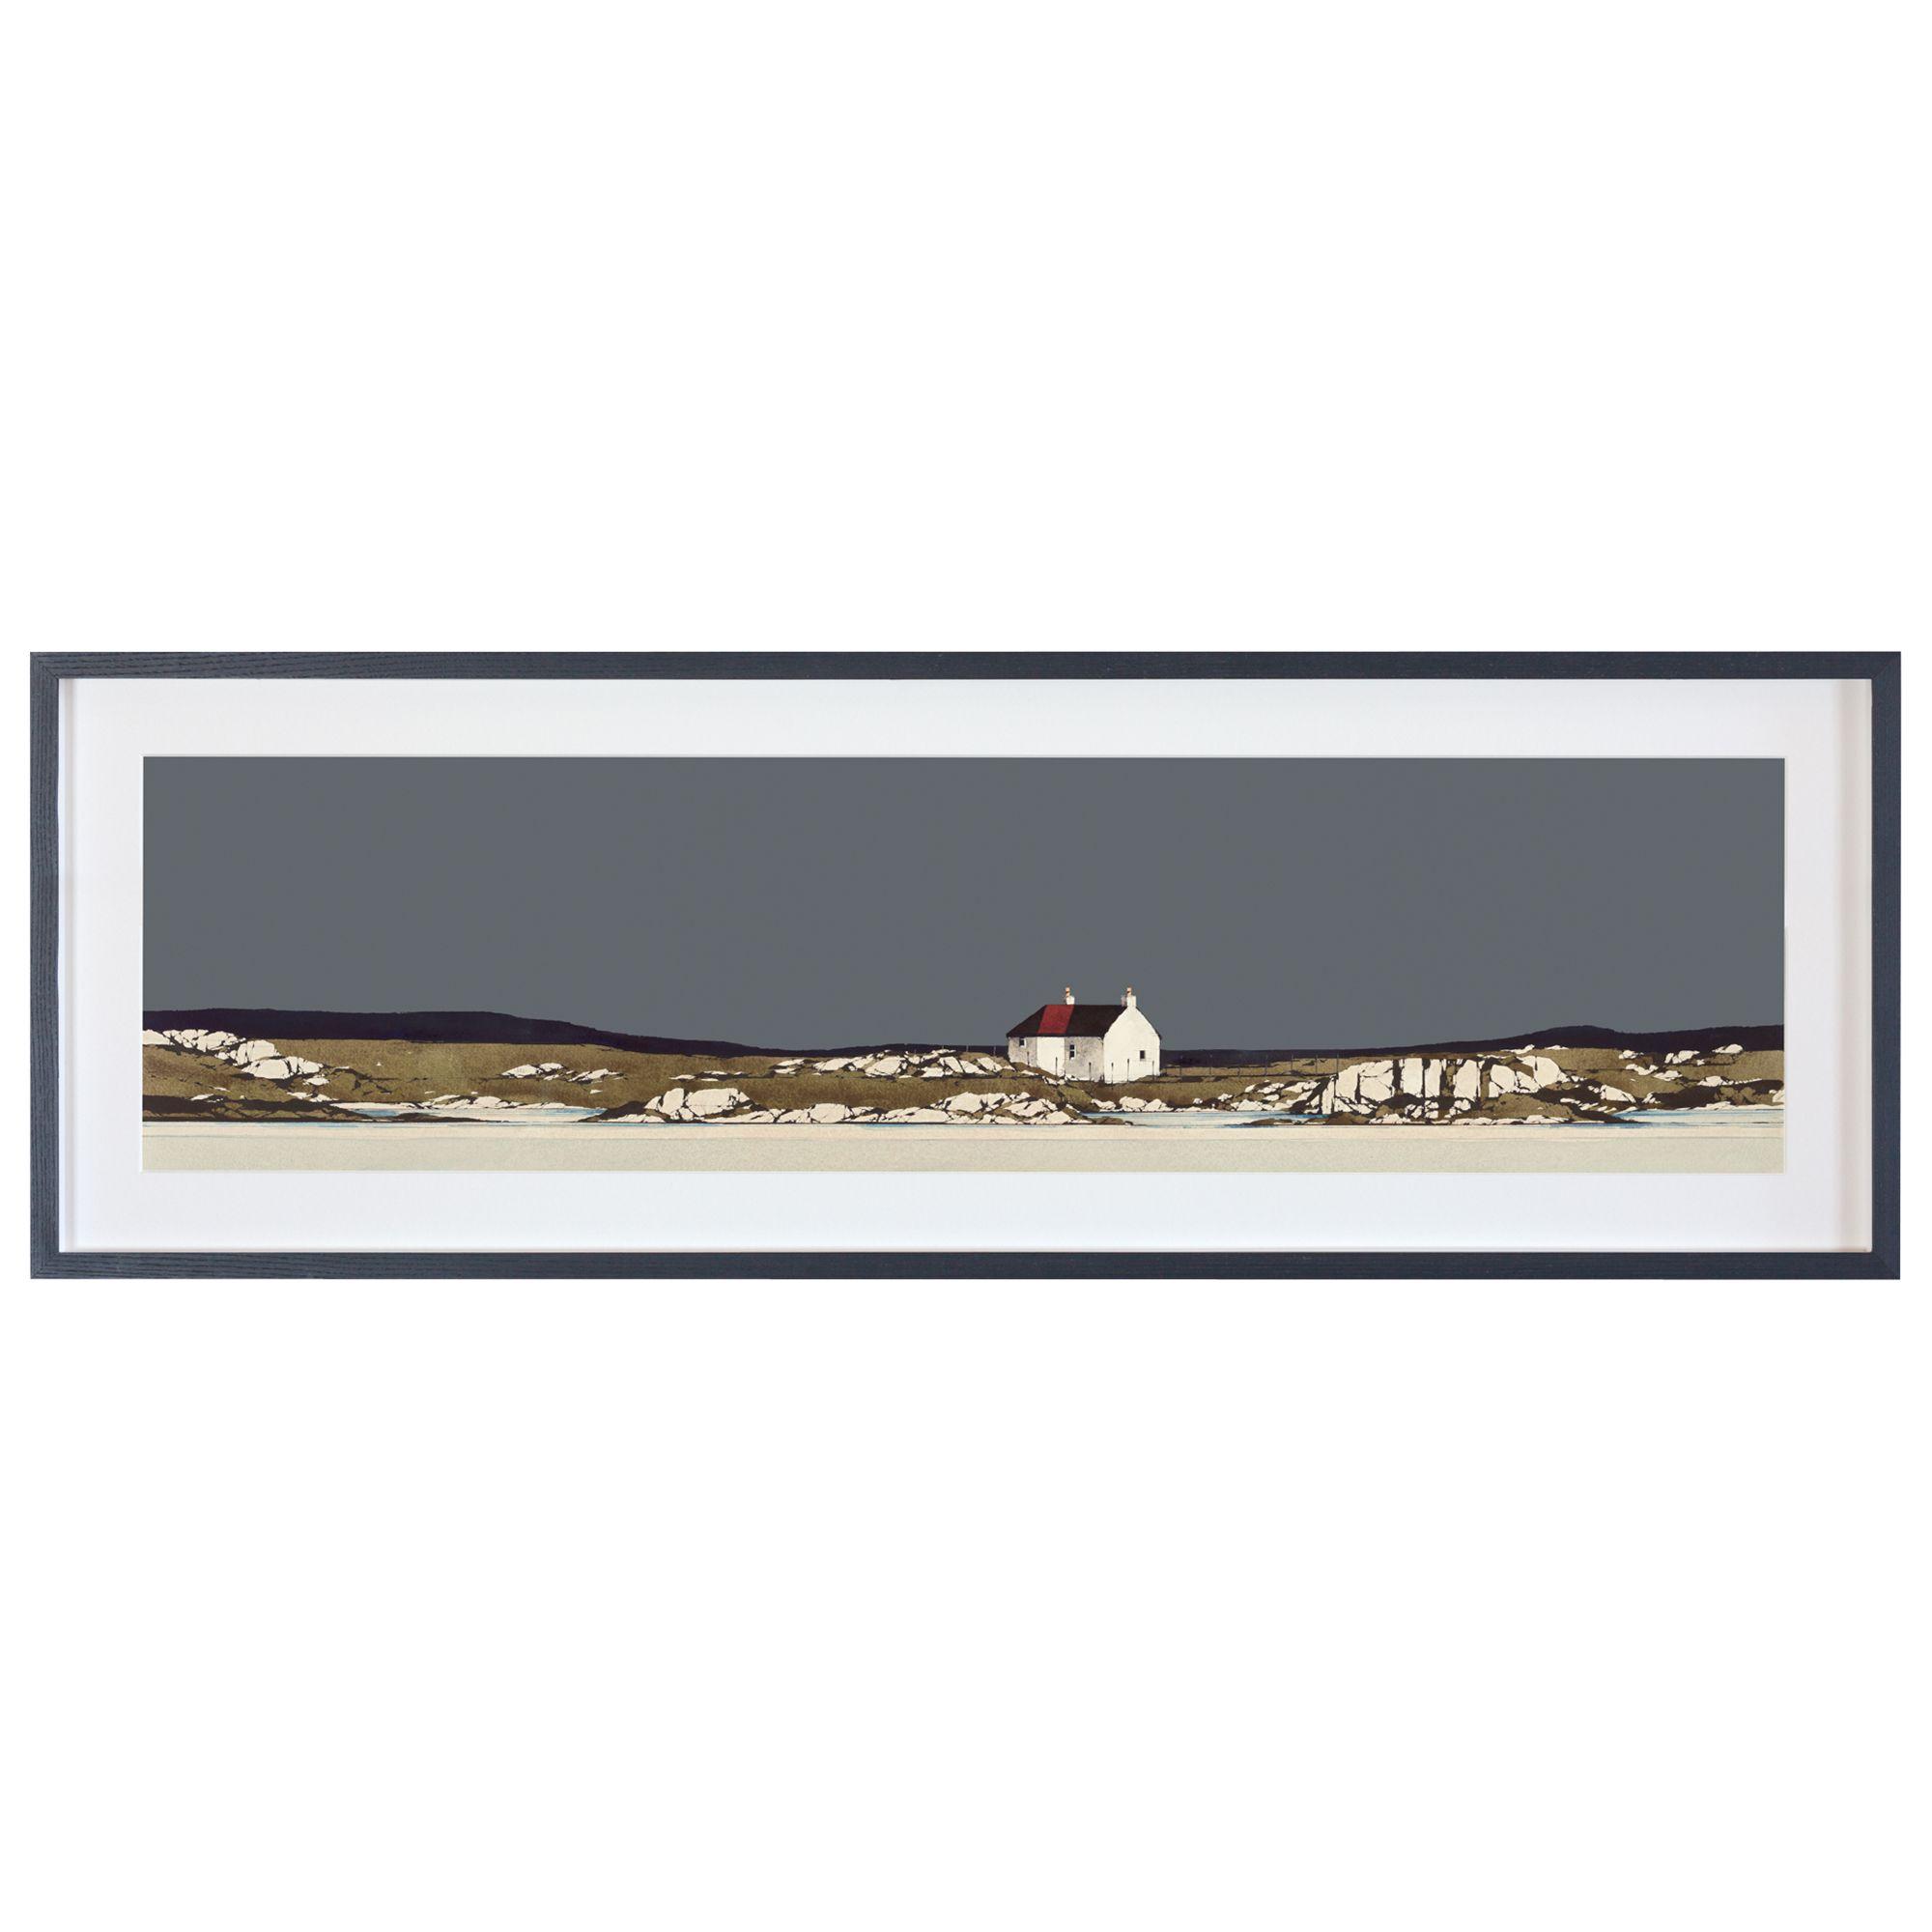 Unbranded Ron Lawson - Traigh Mhor Barra Framed Print & Mount, 36 x 108cm